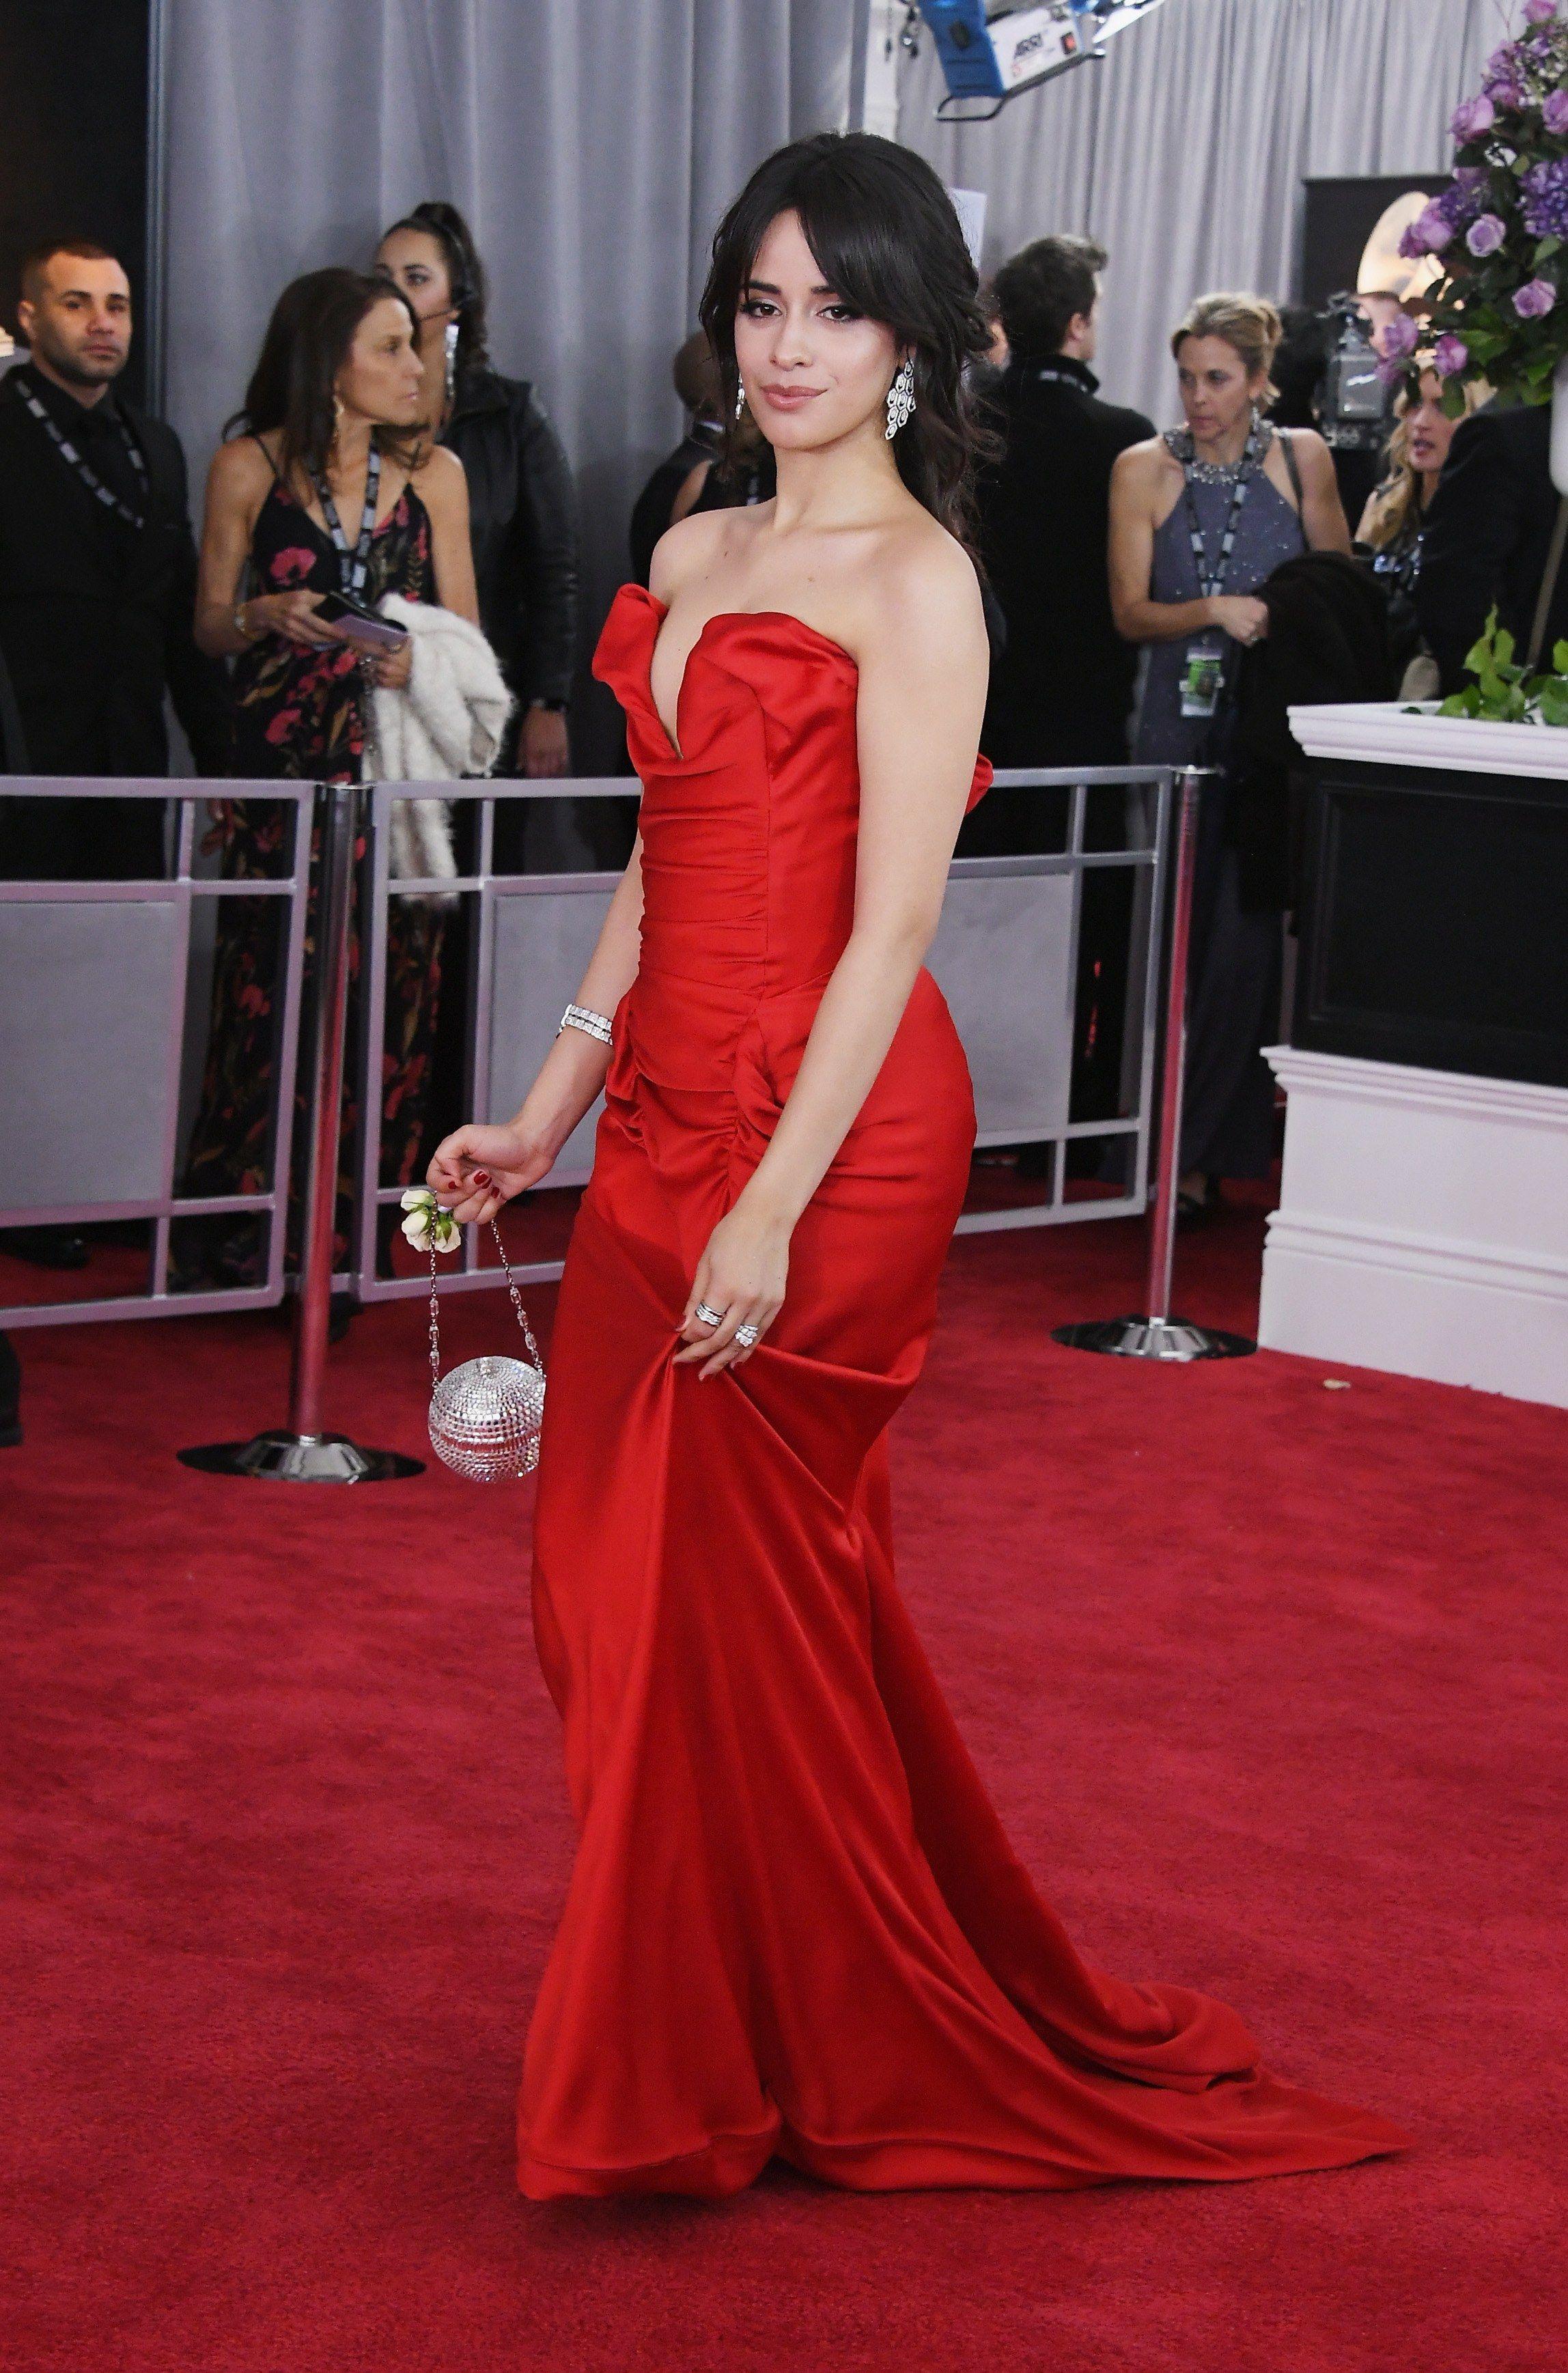 Thời trang thảm đỏ Grammy Camila Cabello